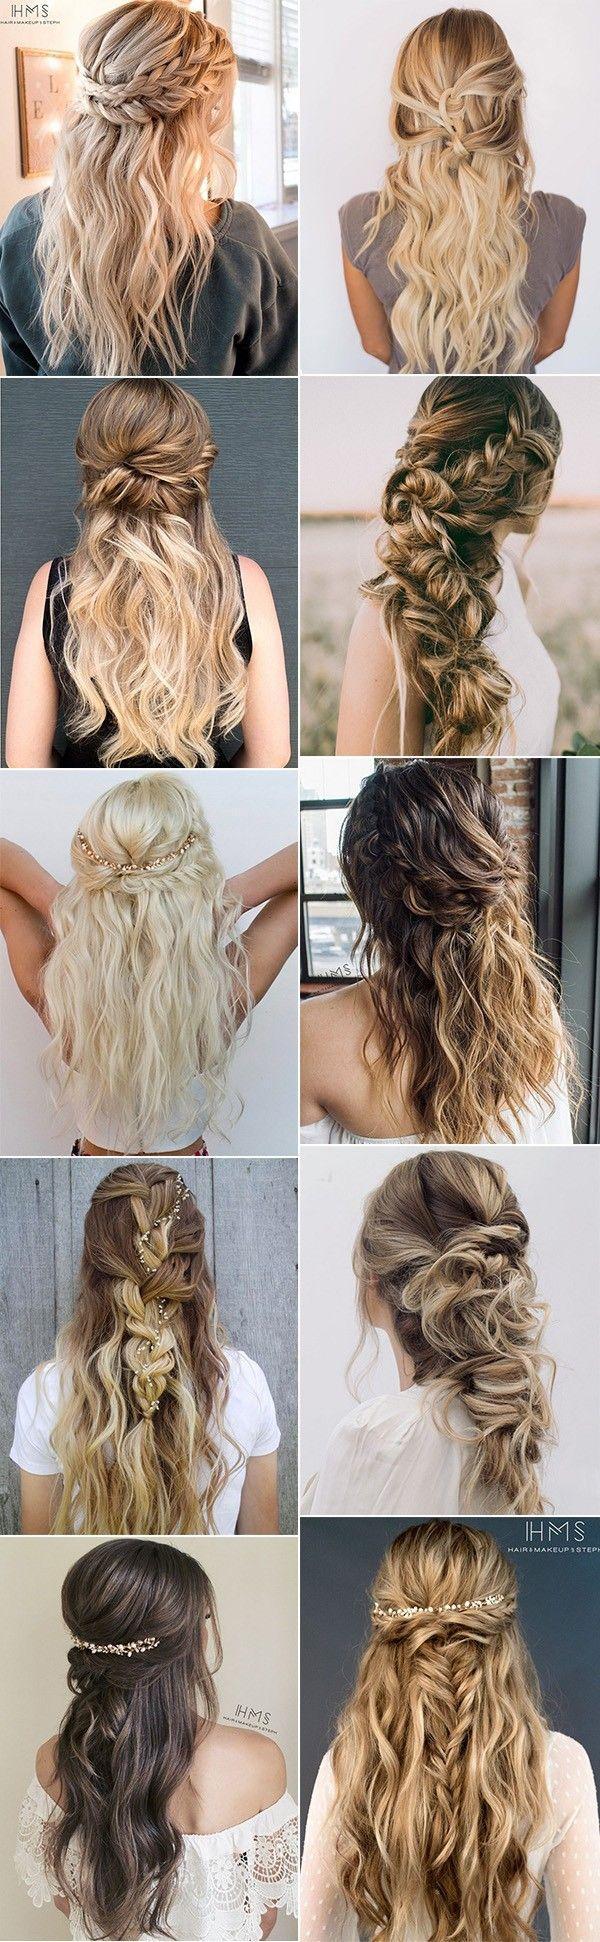 Свадьба - 20 Inspiring Wedding Hairstyles From Steph On Instagram